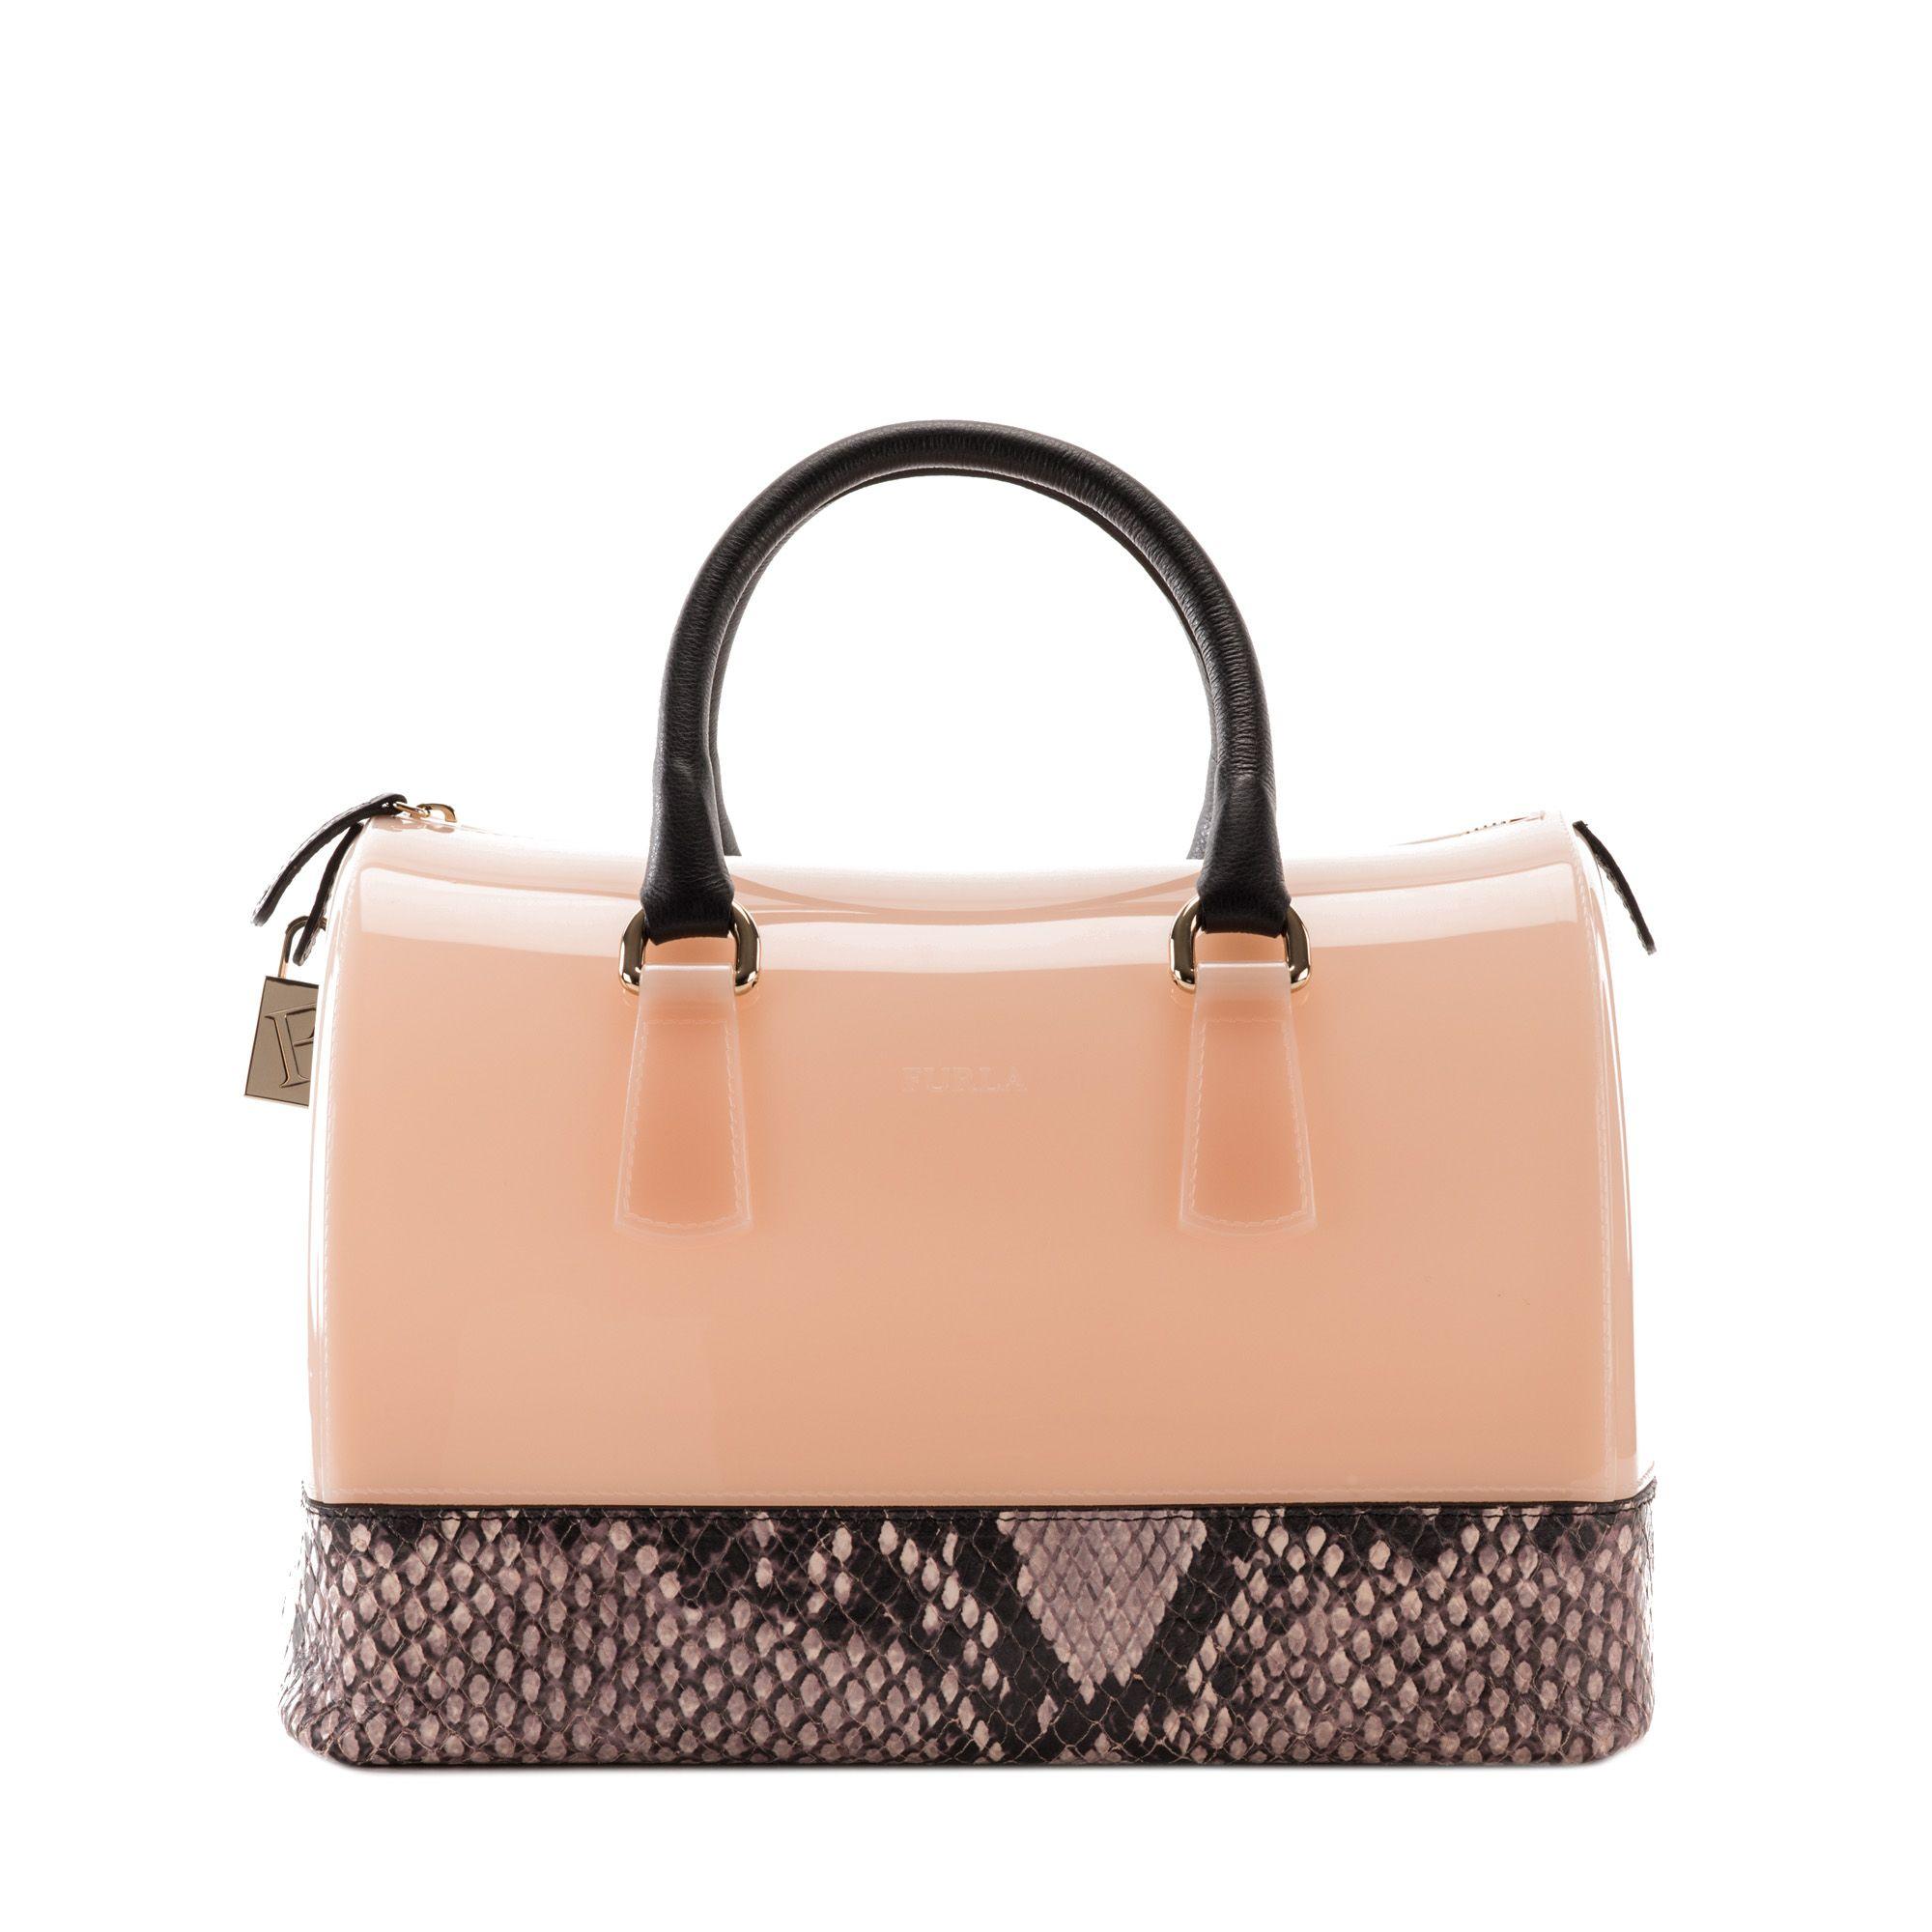 Essentiel Top Handle Handbag On Sale, Green, Leather, 2017, one size